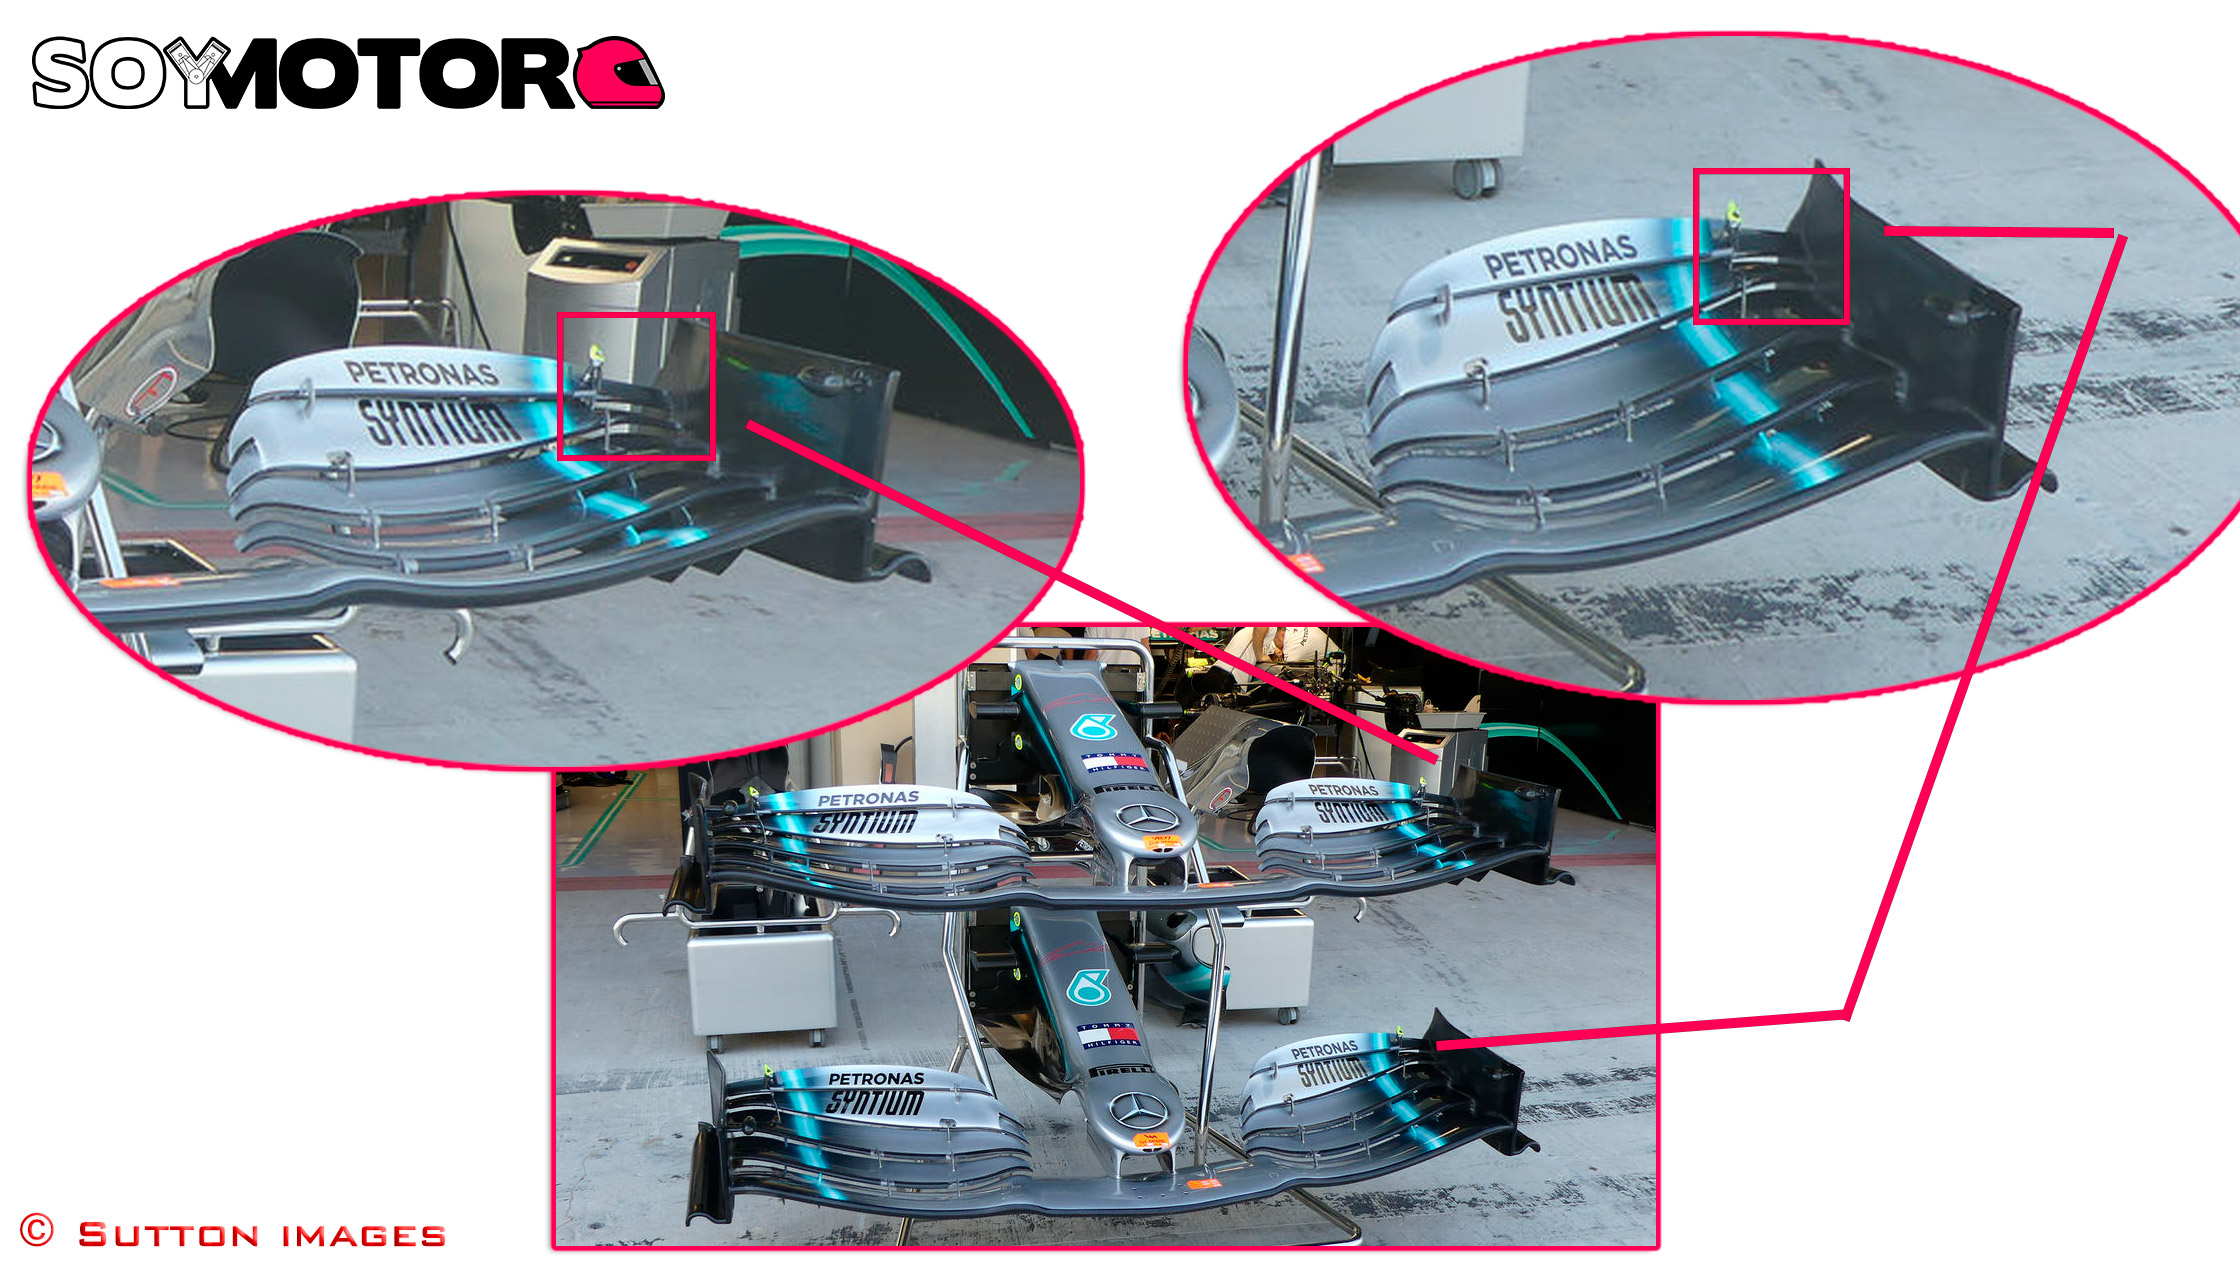 mercedes-alas-delanteras-soymotor.jpg